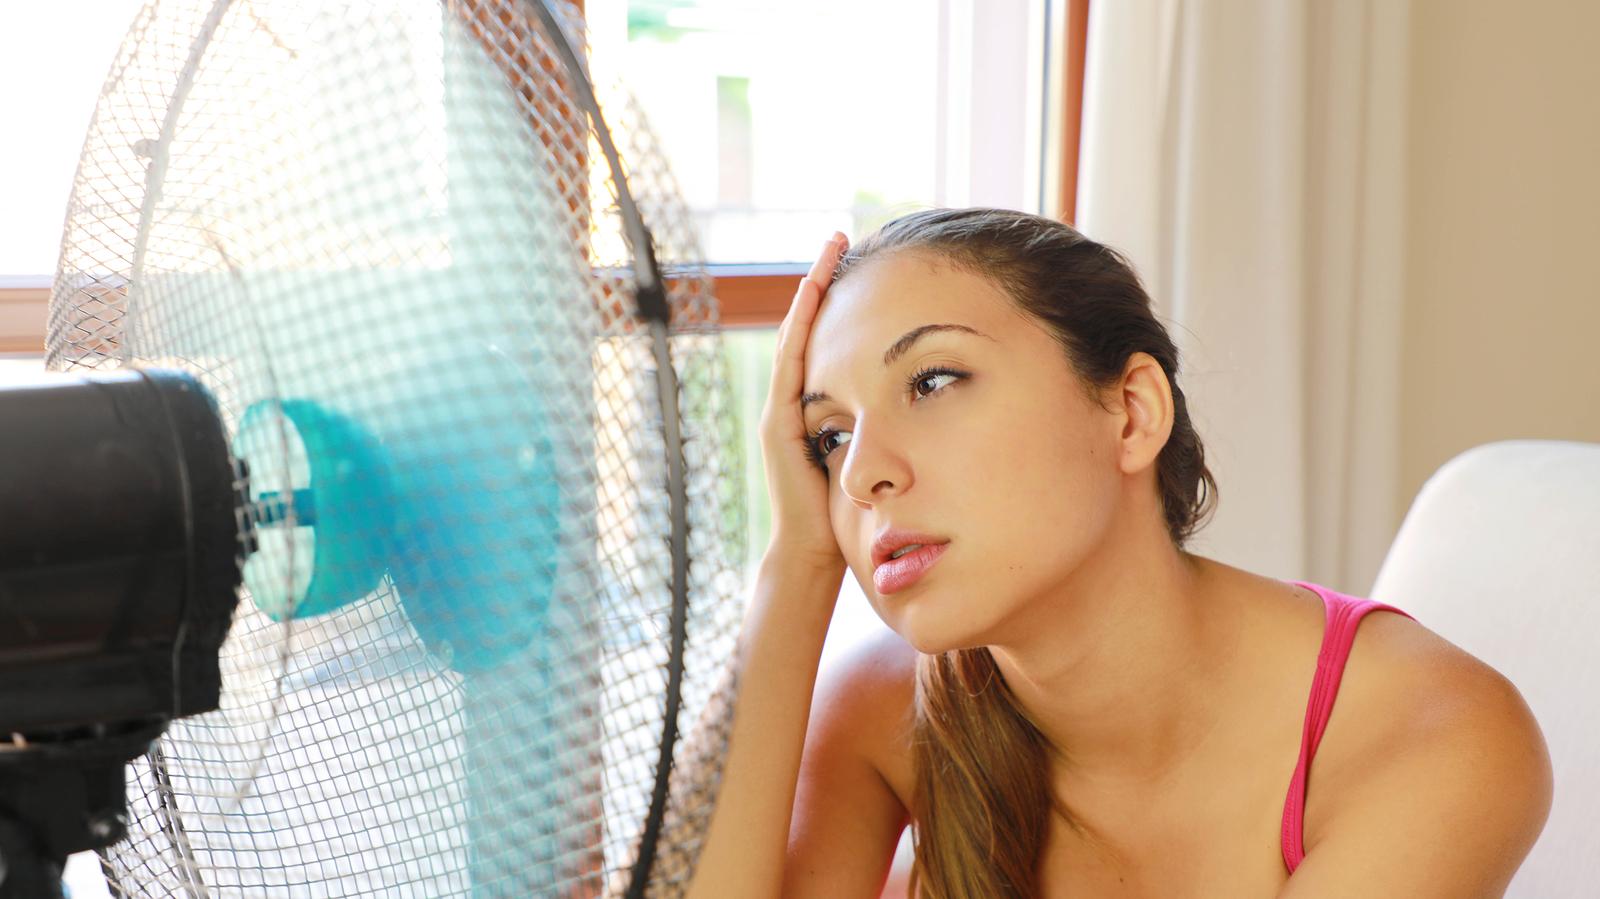 bigstock-Girl-Suffering-A-Heat-Wave-Usi-318588751